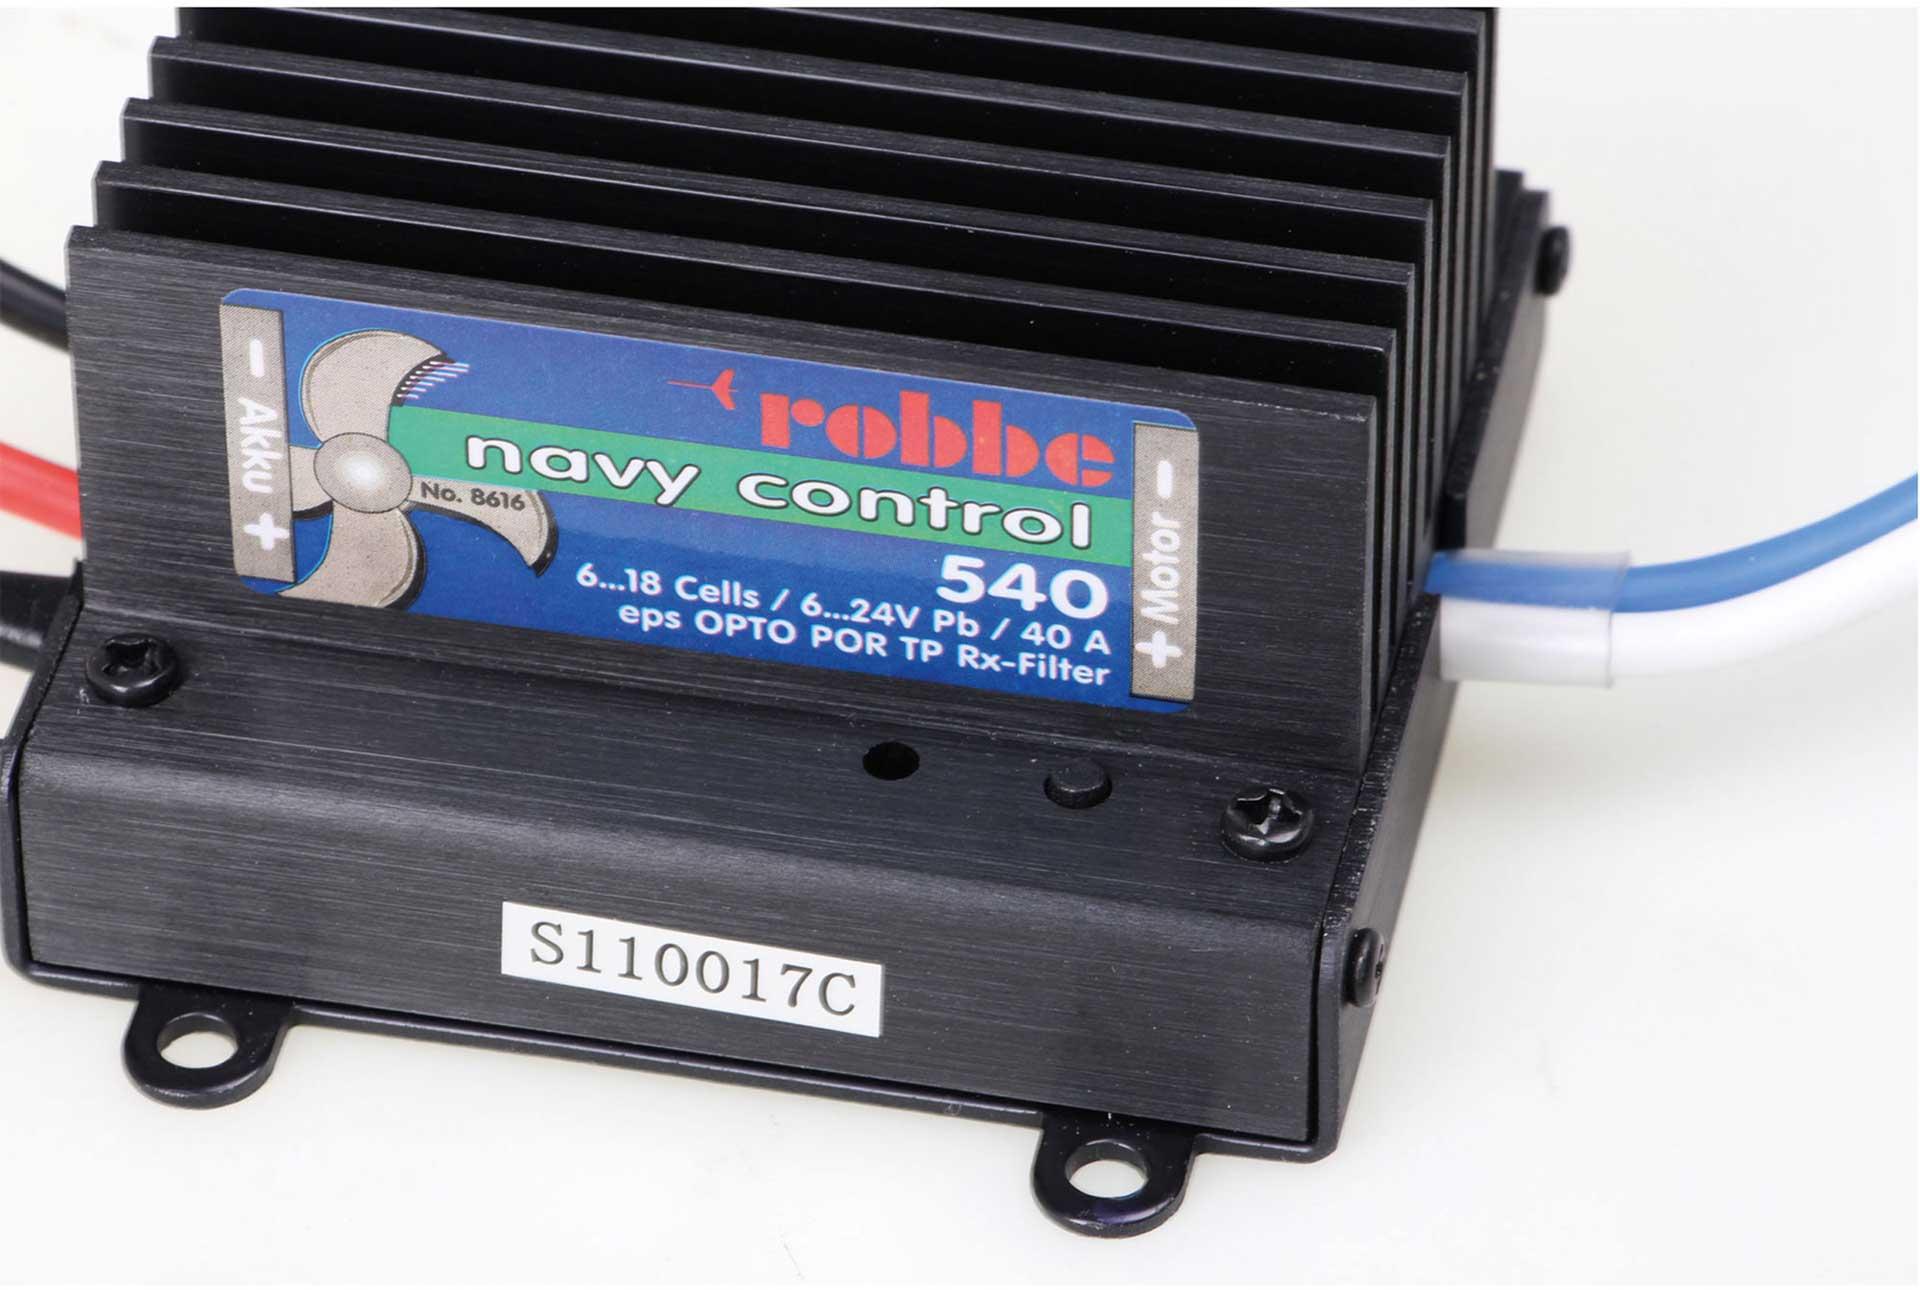 Robbe Modellsport NAVY Control 540 R Control Unit